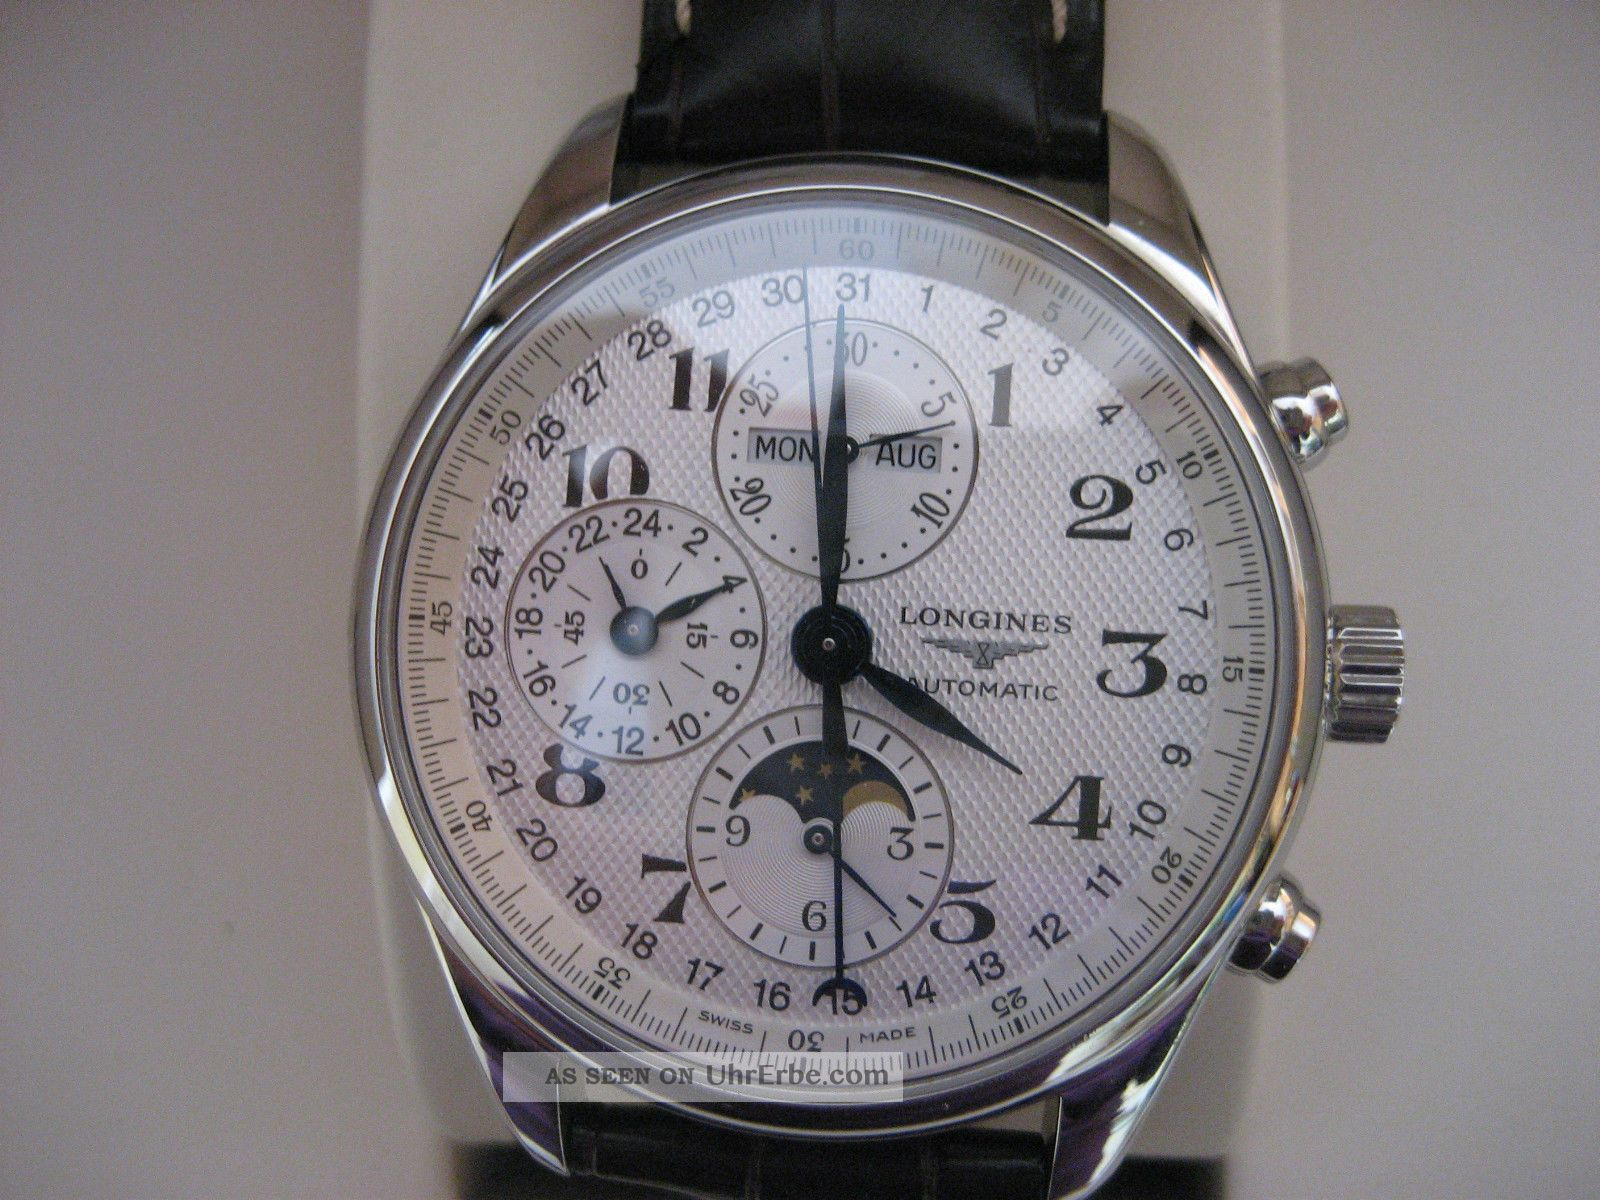 Longines Chronograf,  Heritage,  Superzustand,  Kaufdatum 2012 Armbanduhren Bild